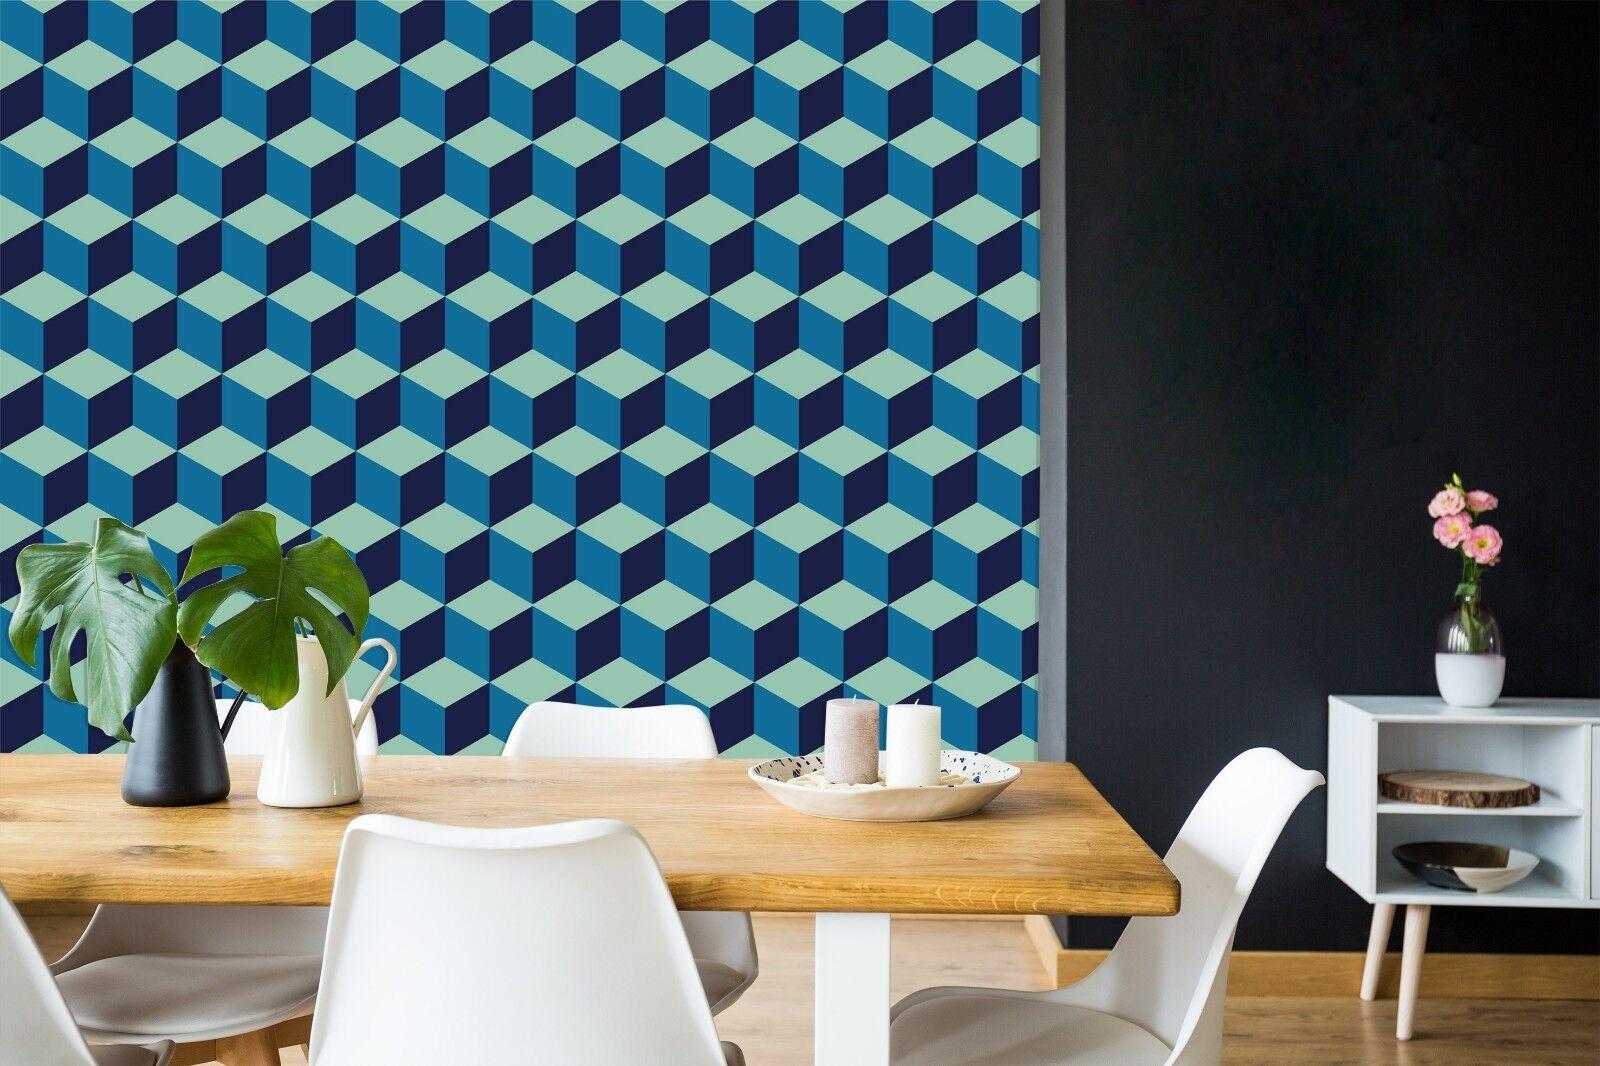 3D Blau Grid Patterns 26 WallPaper Murals Wall Decal Decal Decal WallPaper AU Summer 5801aa